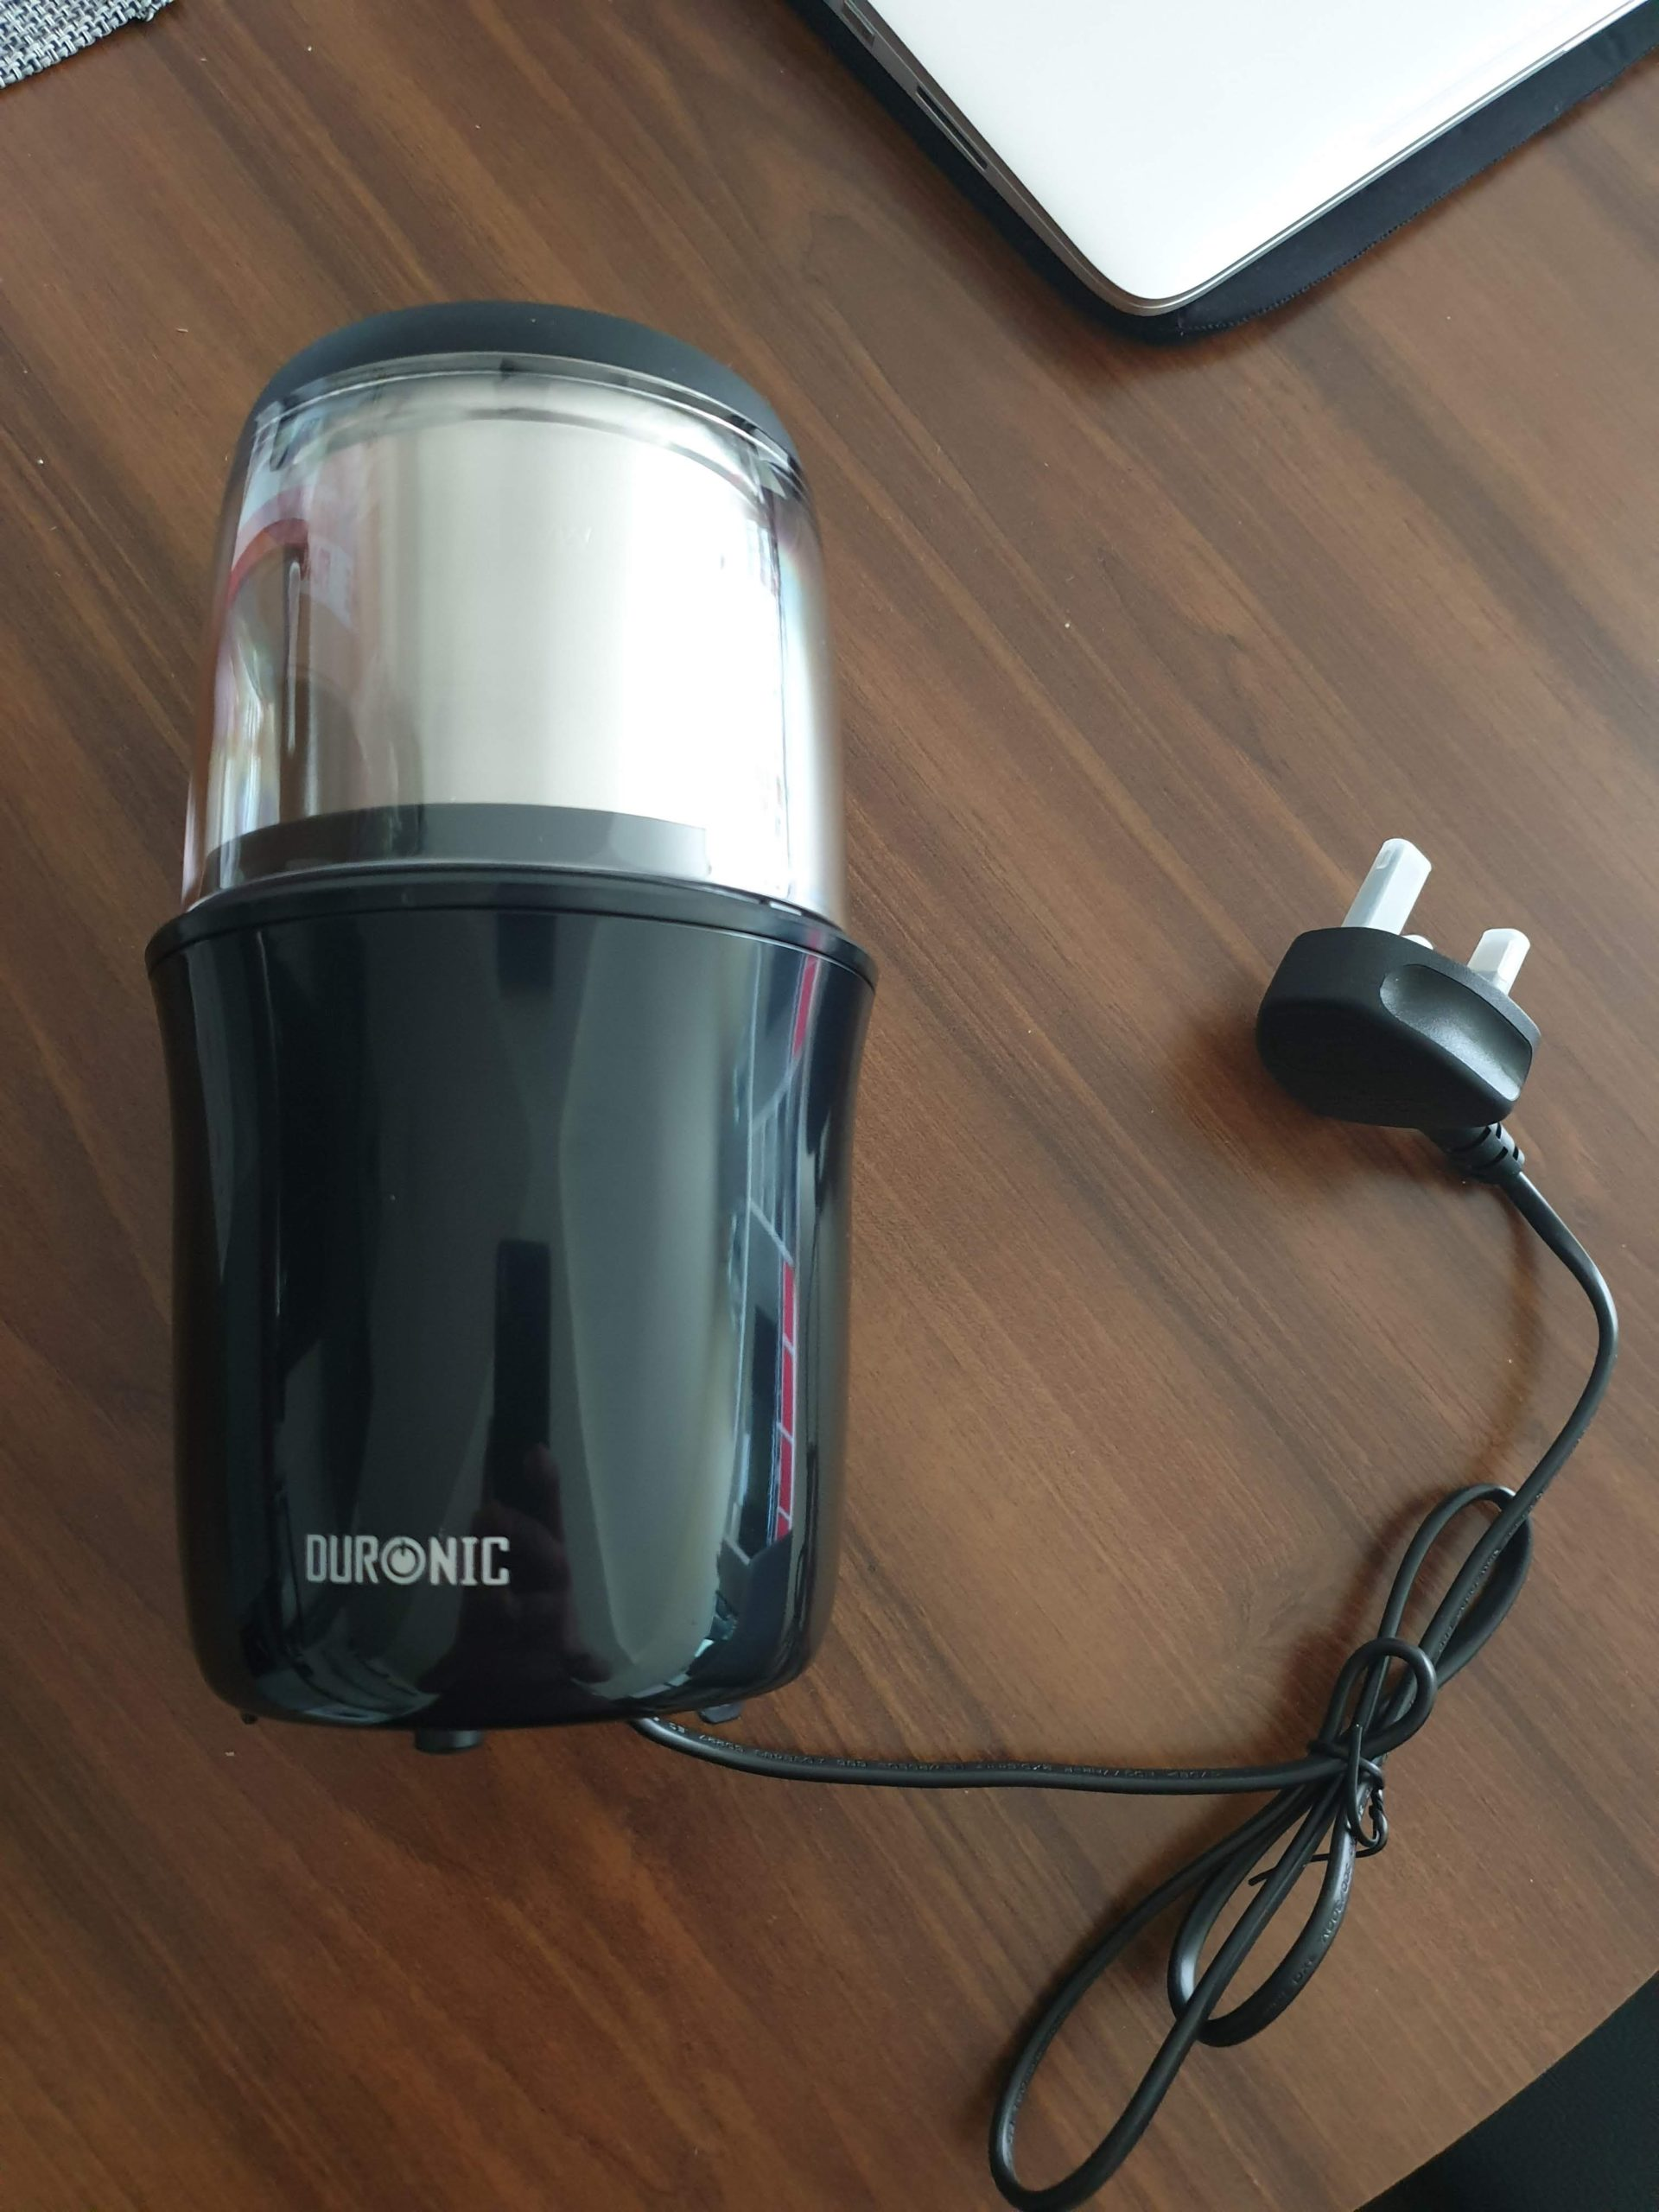 duronic coffee grinder CG250